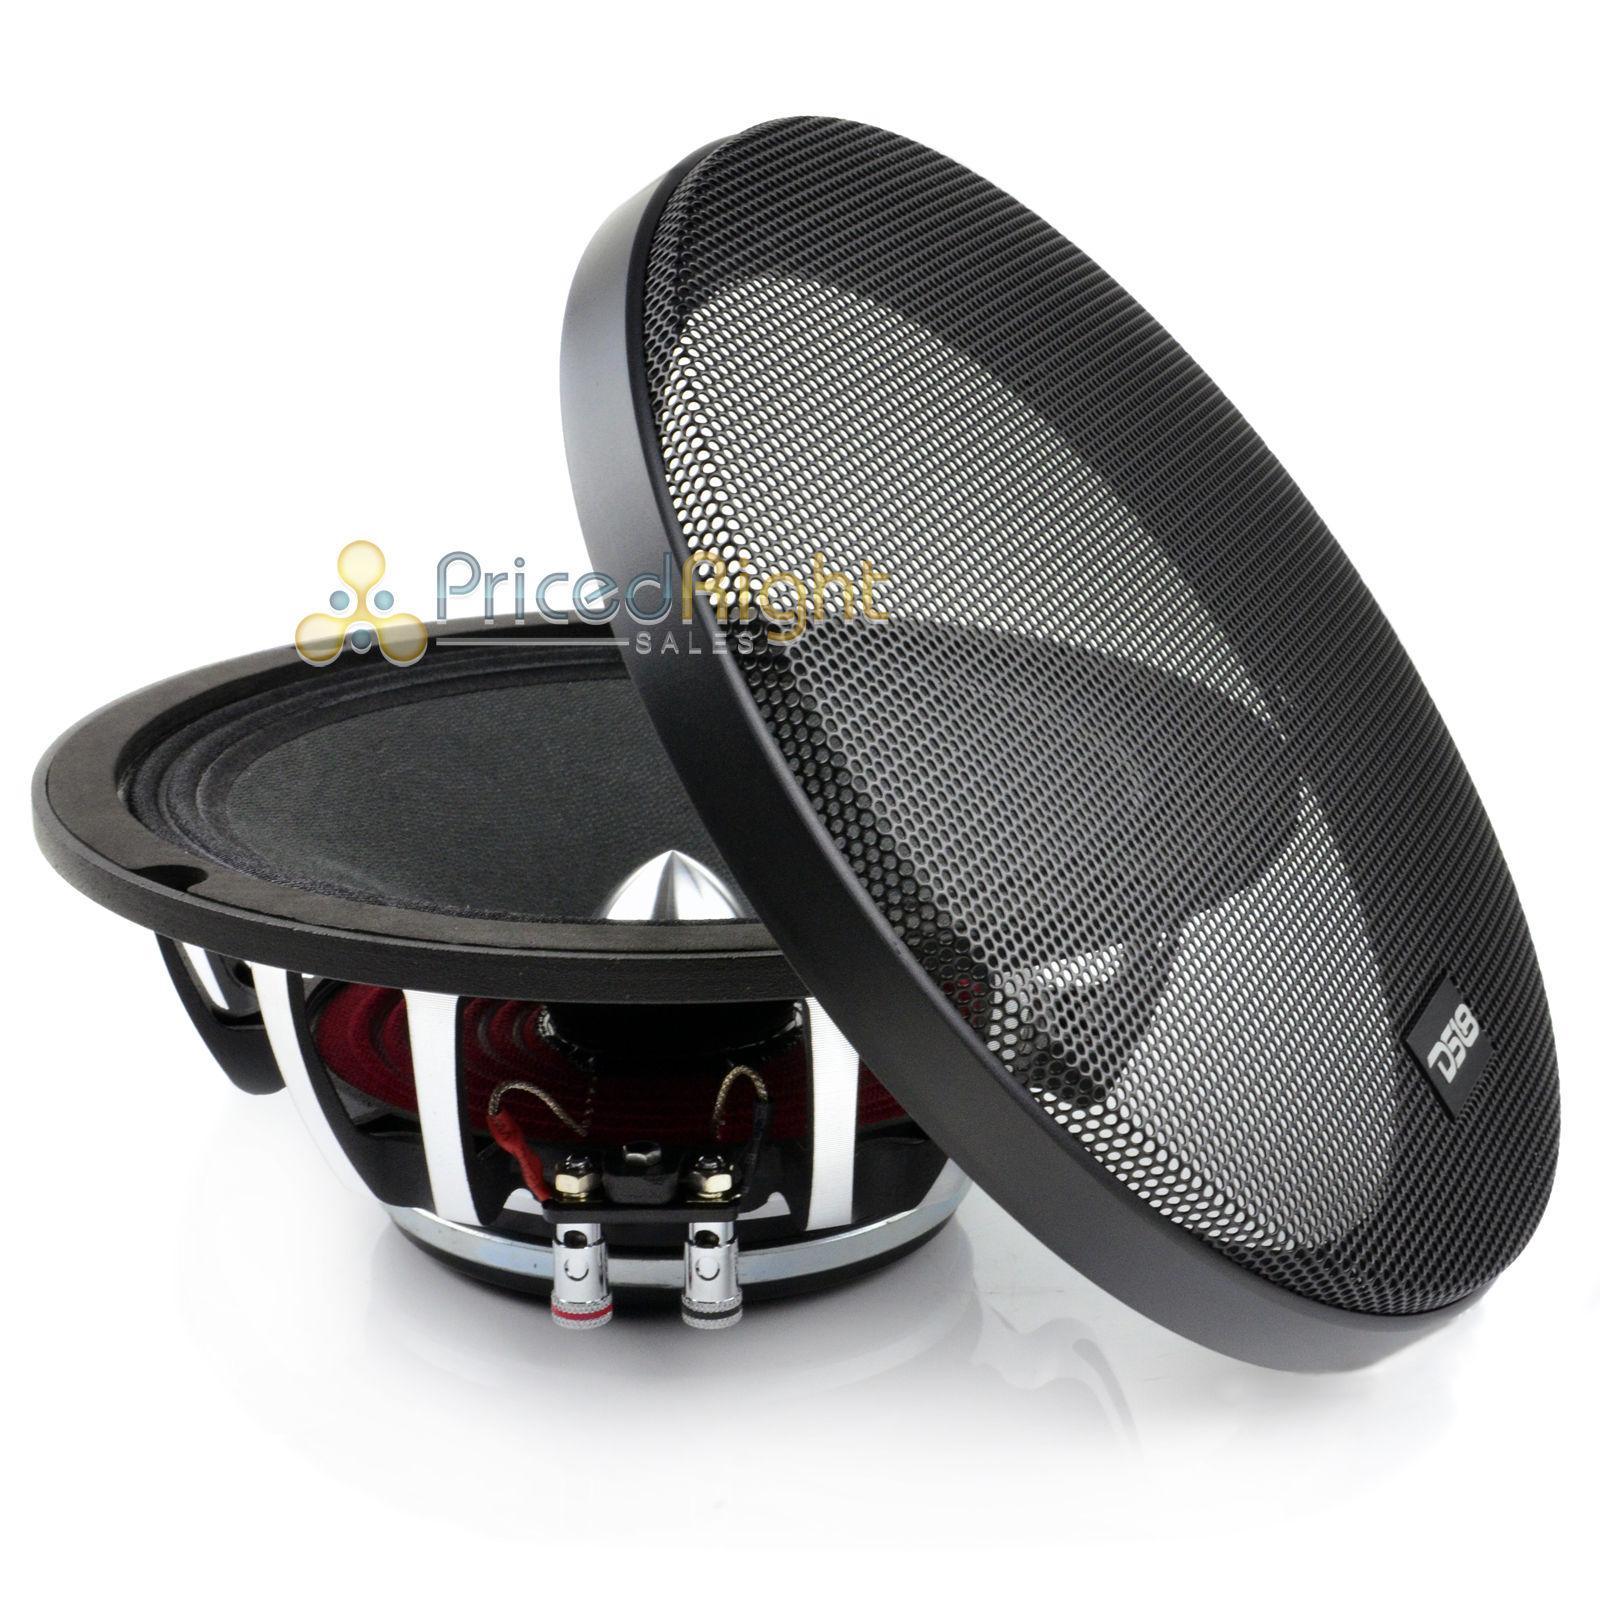 2 Ds18 8 U0026quot  Inch Midrange Speaker 500 Watts Max Power Pro